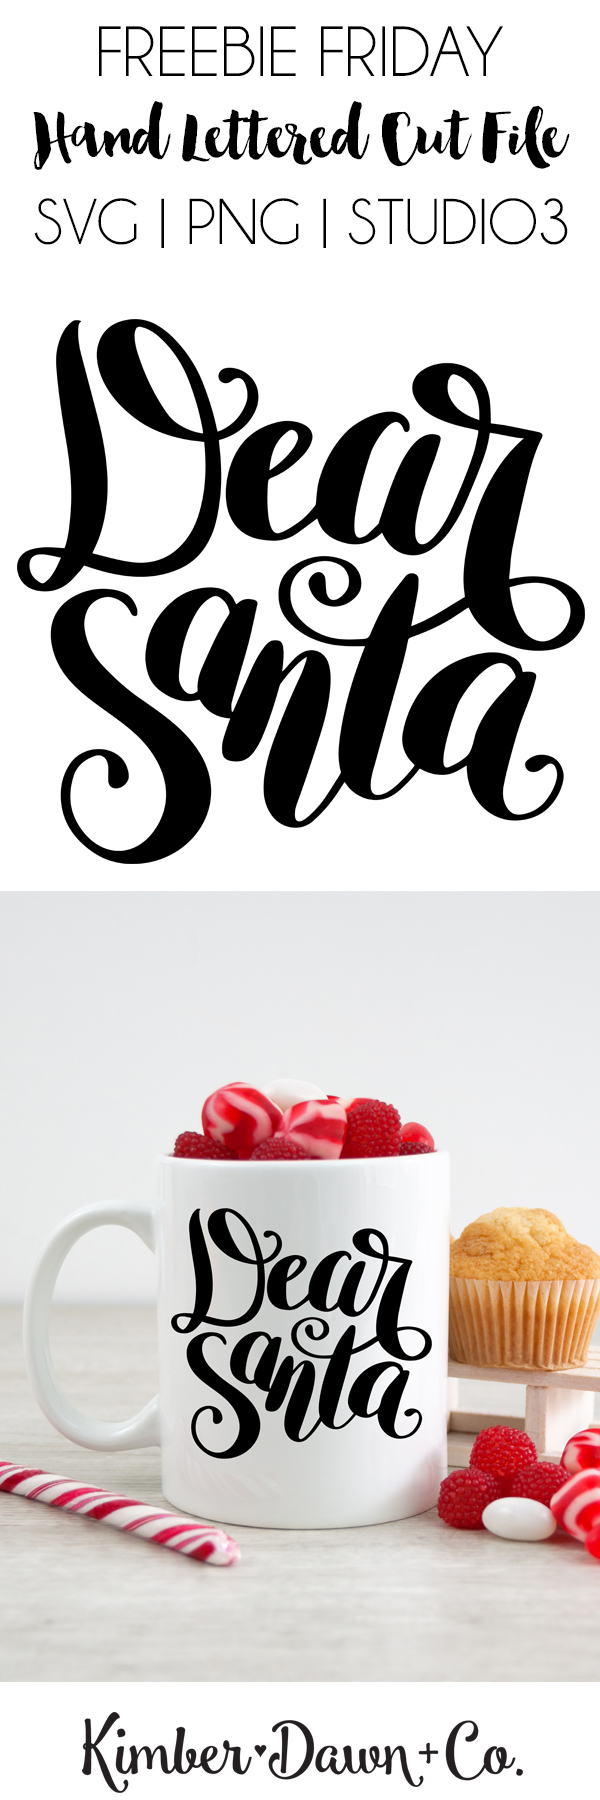 Hand Lettered Dear Santa Free SVG Cut File | KimberDawnCo.com